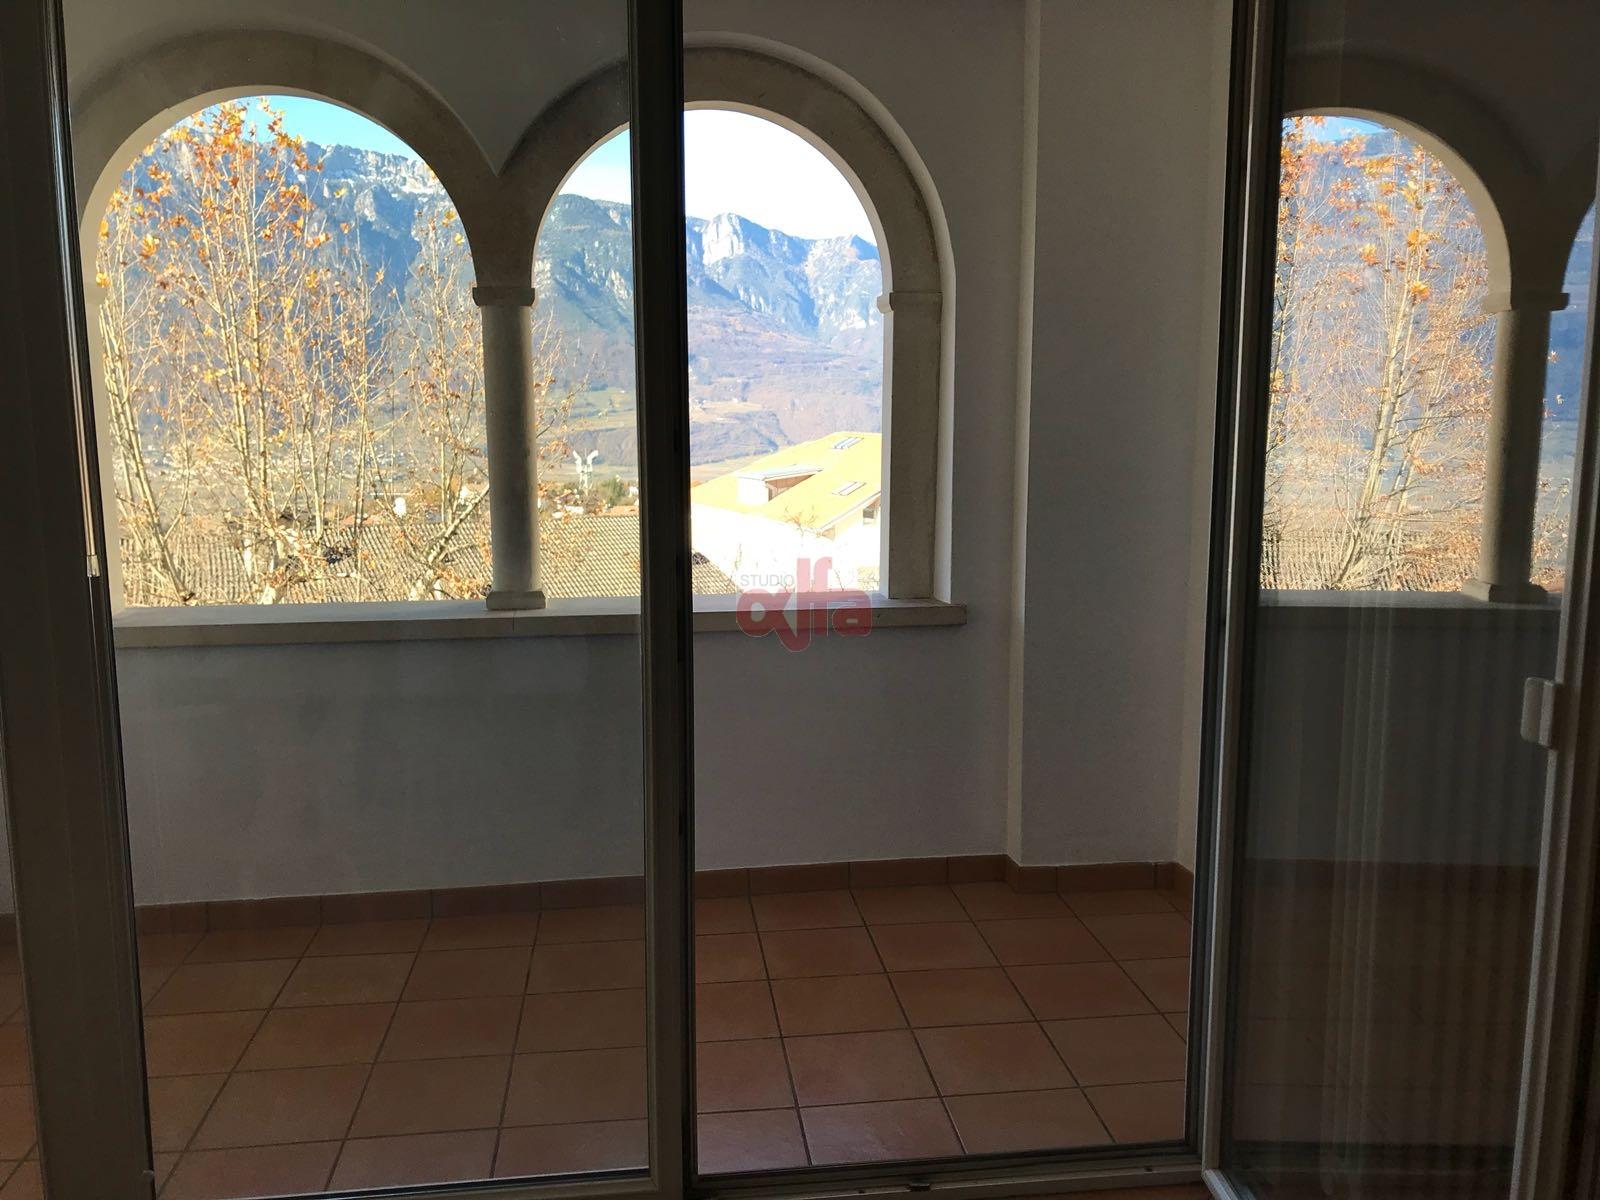 Montagna - Montan - Via Glen